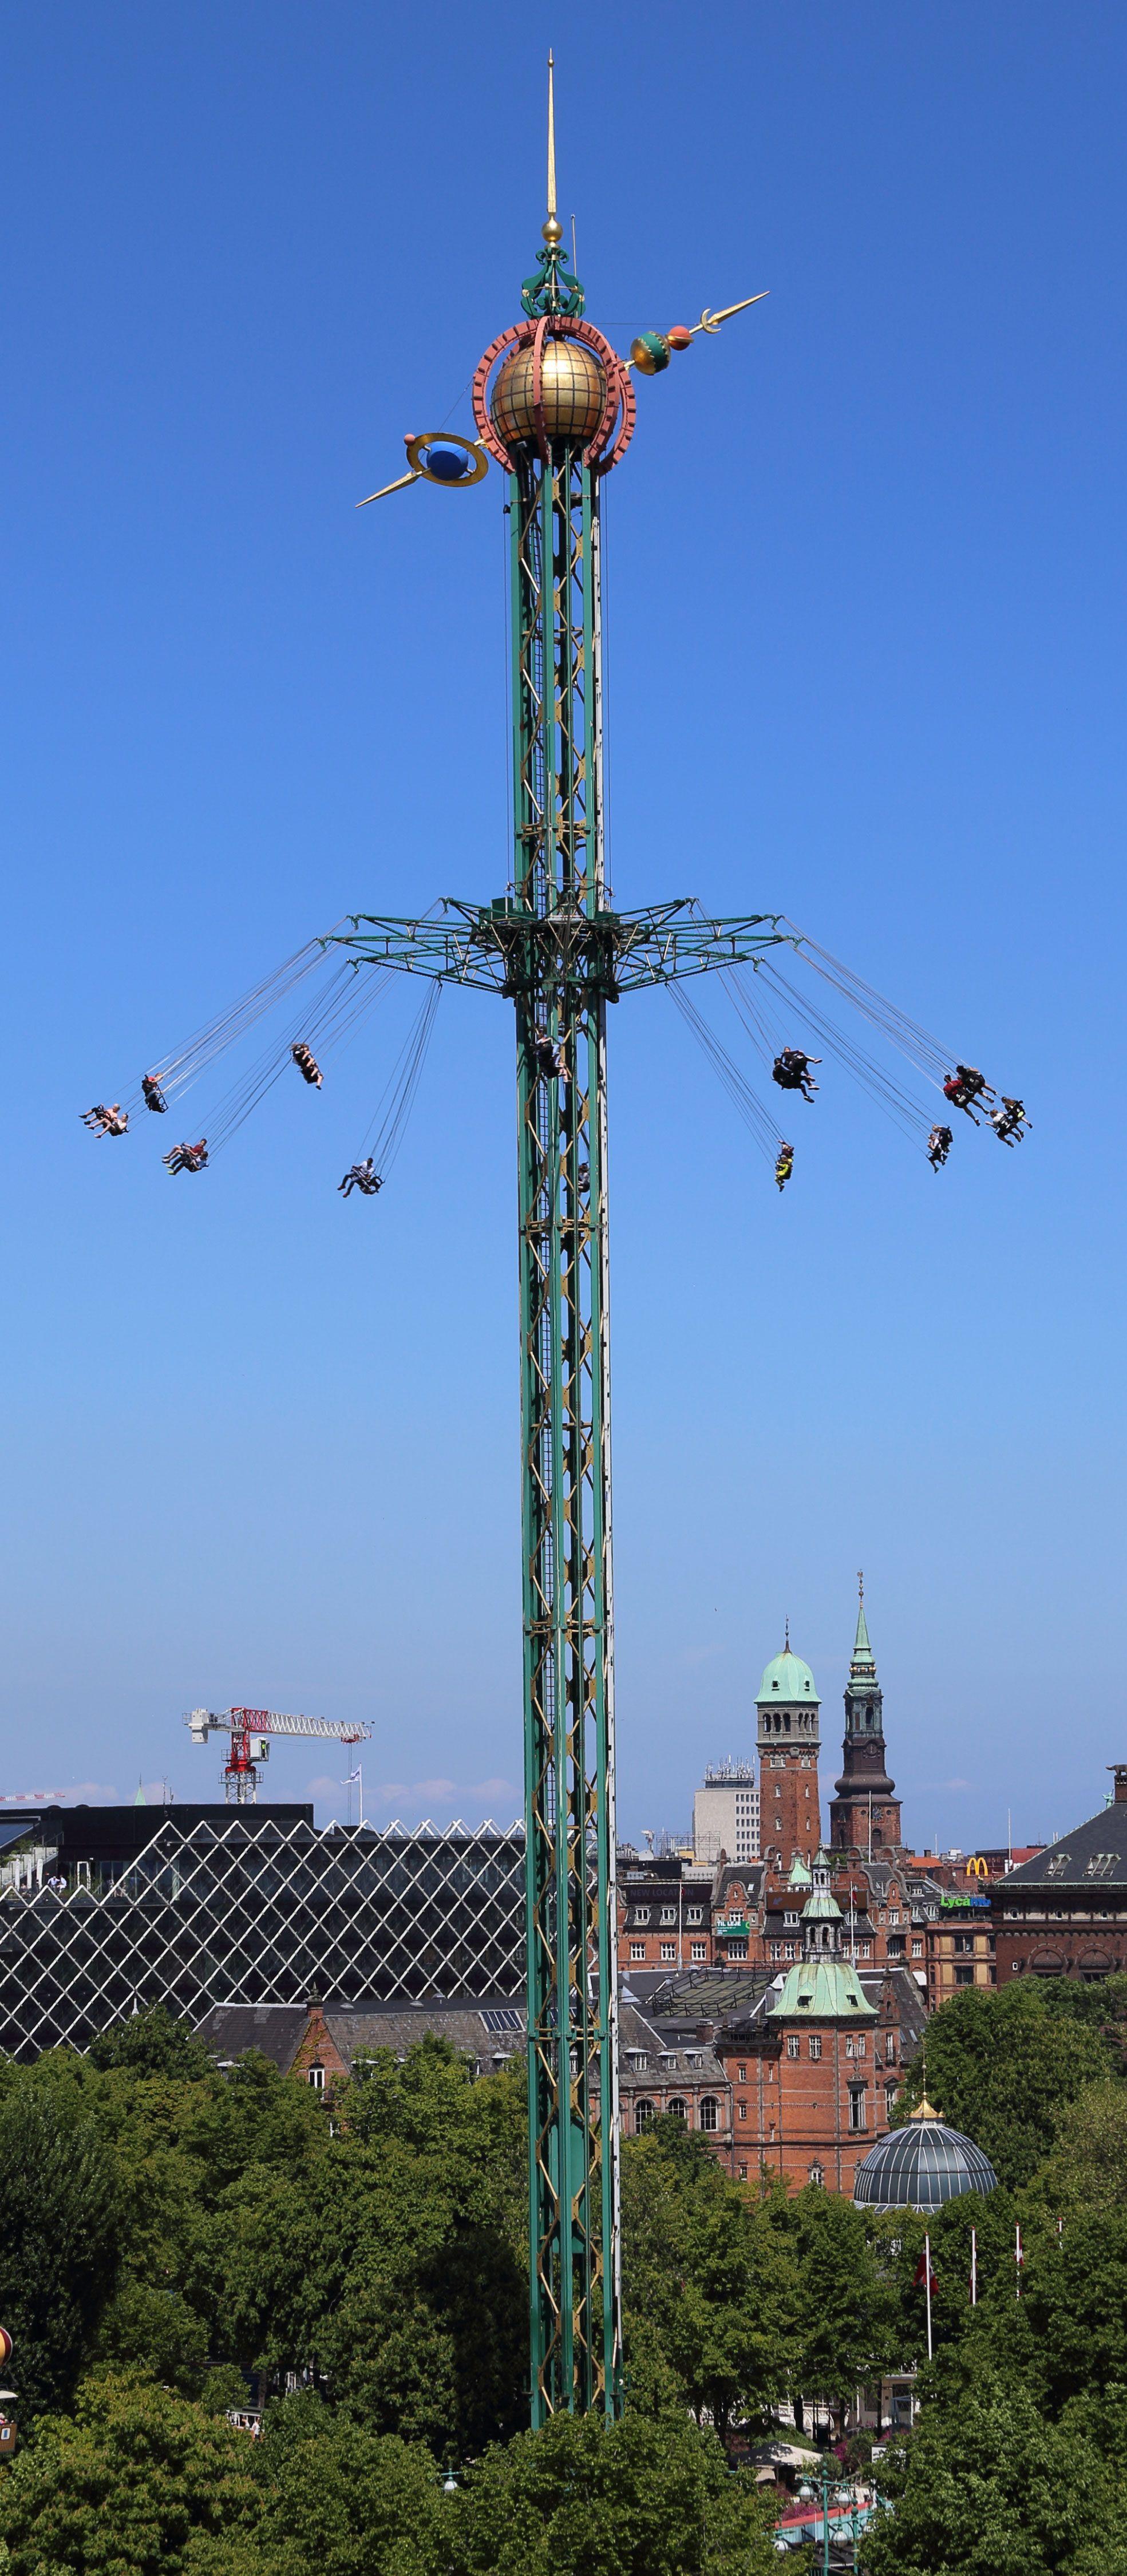 The Himmelskibet ride in Tivoli Gardens, Copenhagen